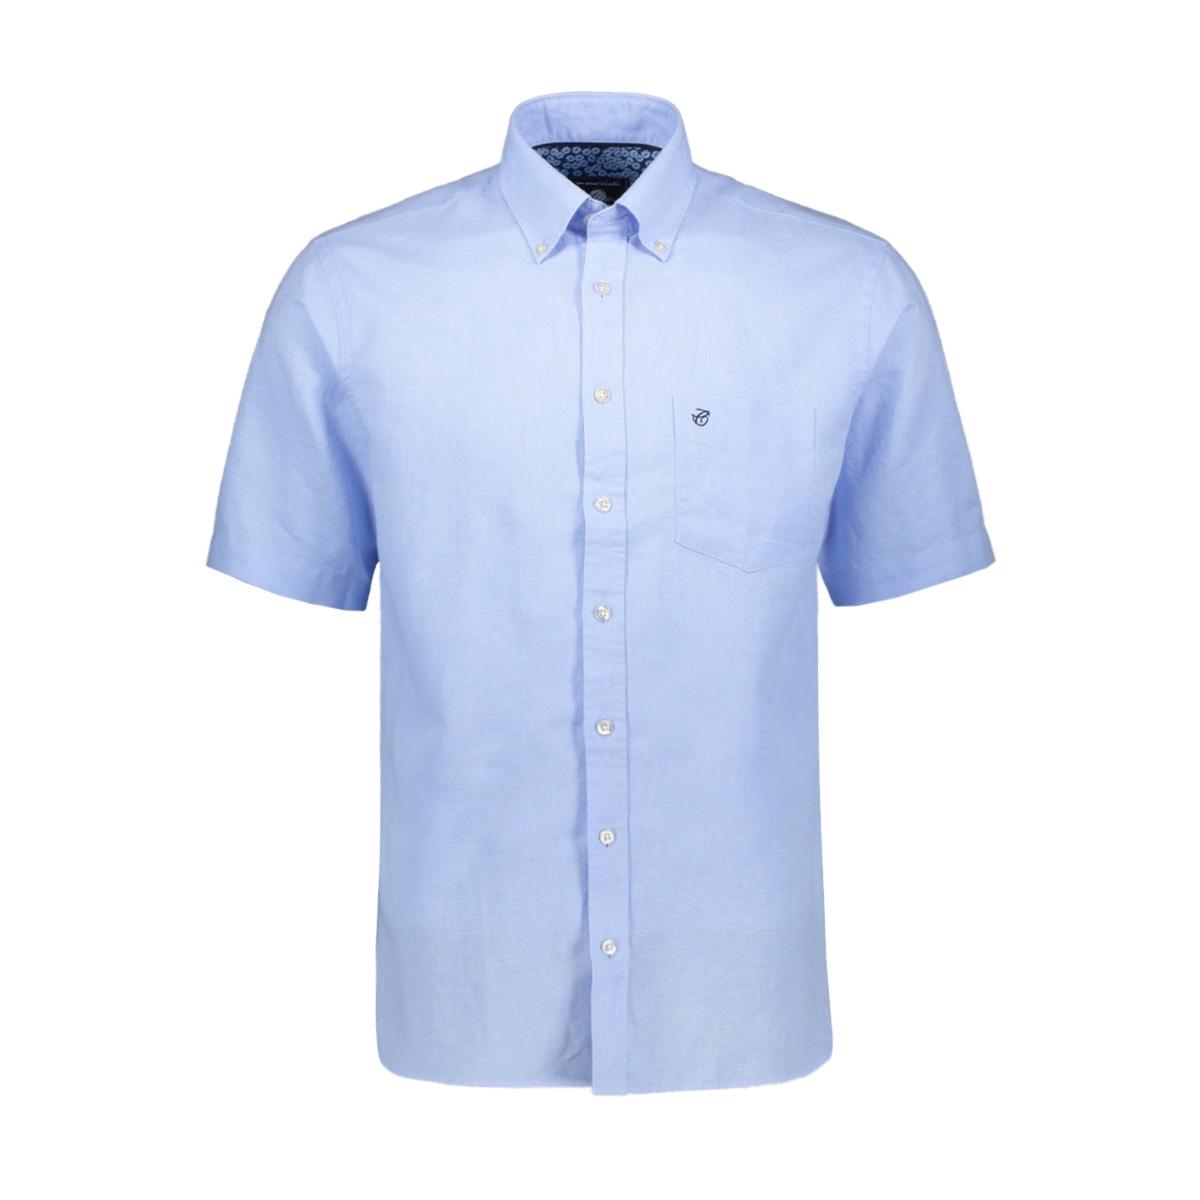 casual overhemd km 052908 campbell overhemd 311 lichtblauw uni